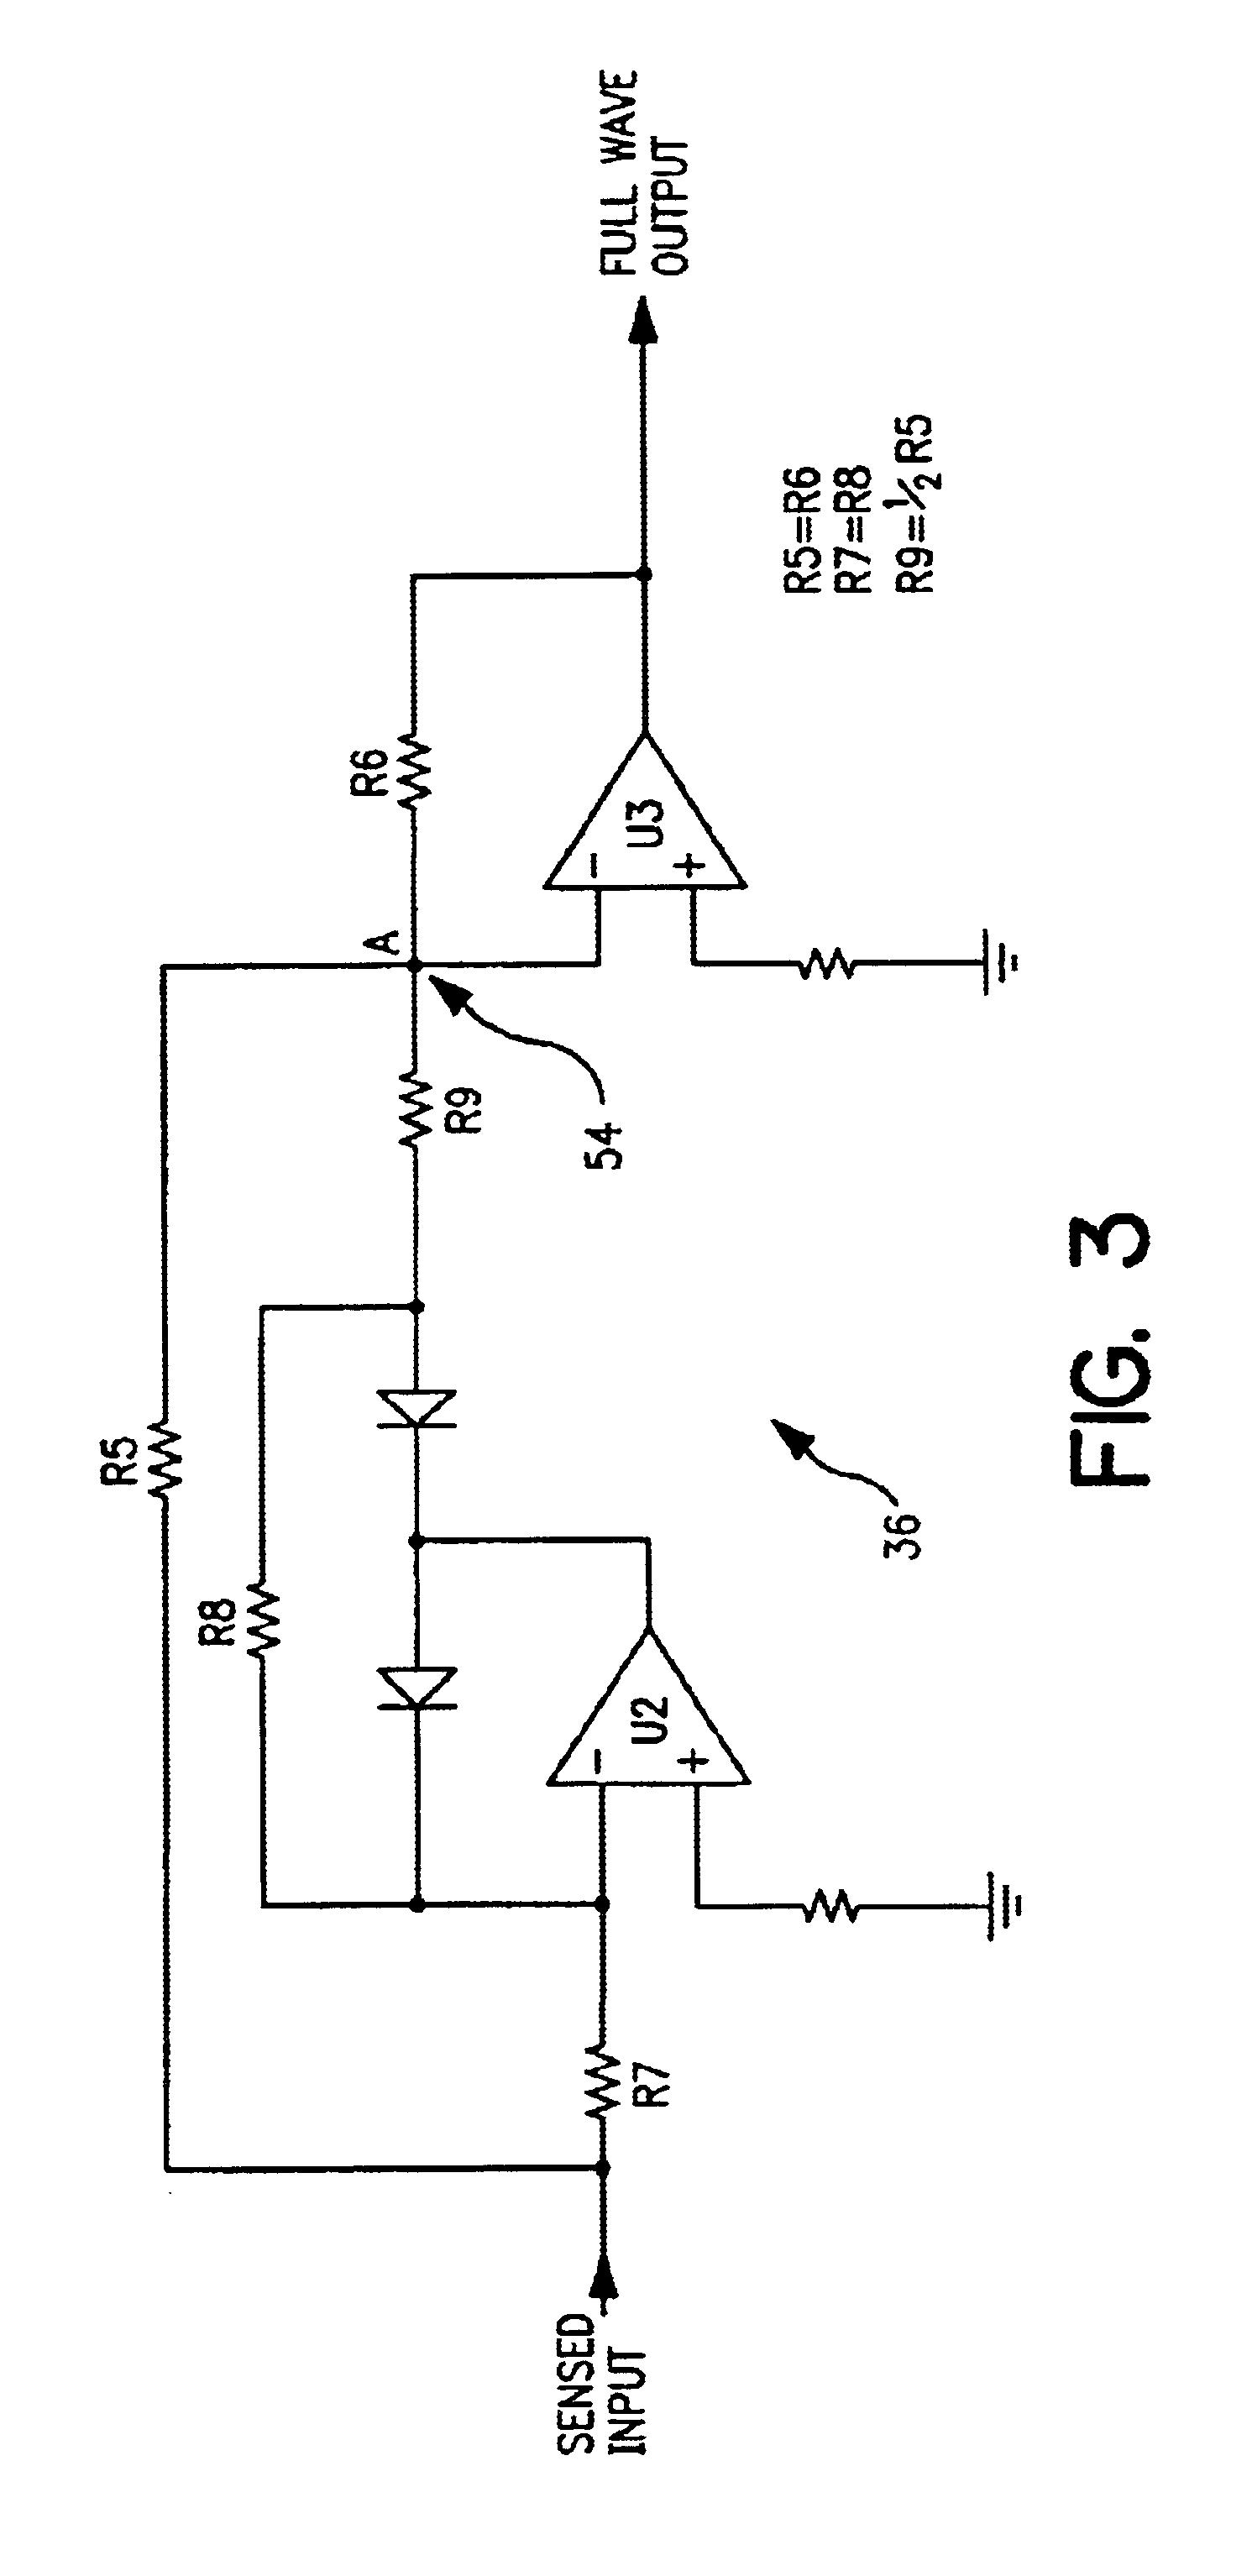 patent us6804094 - ground fault circuit interrupter